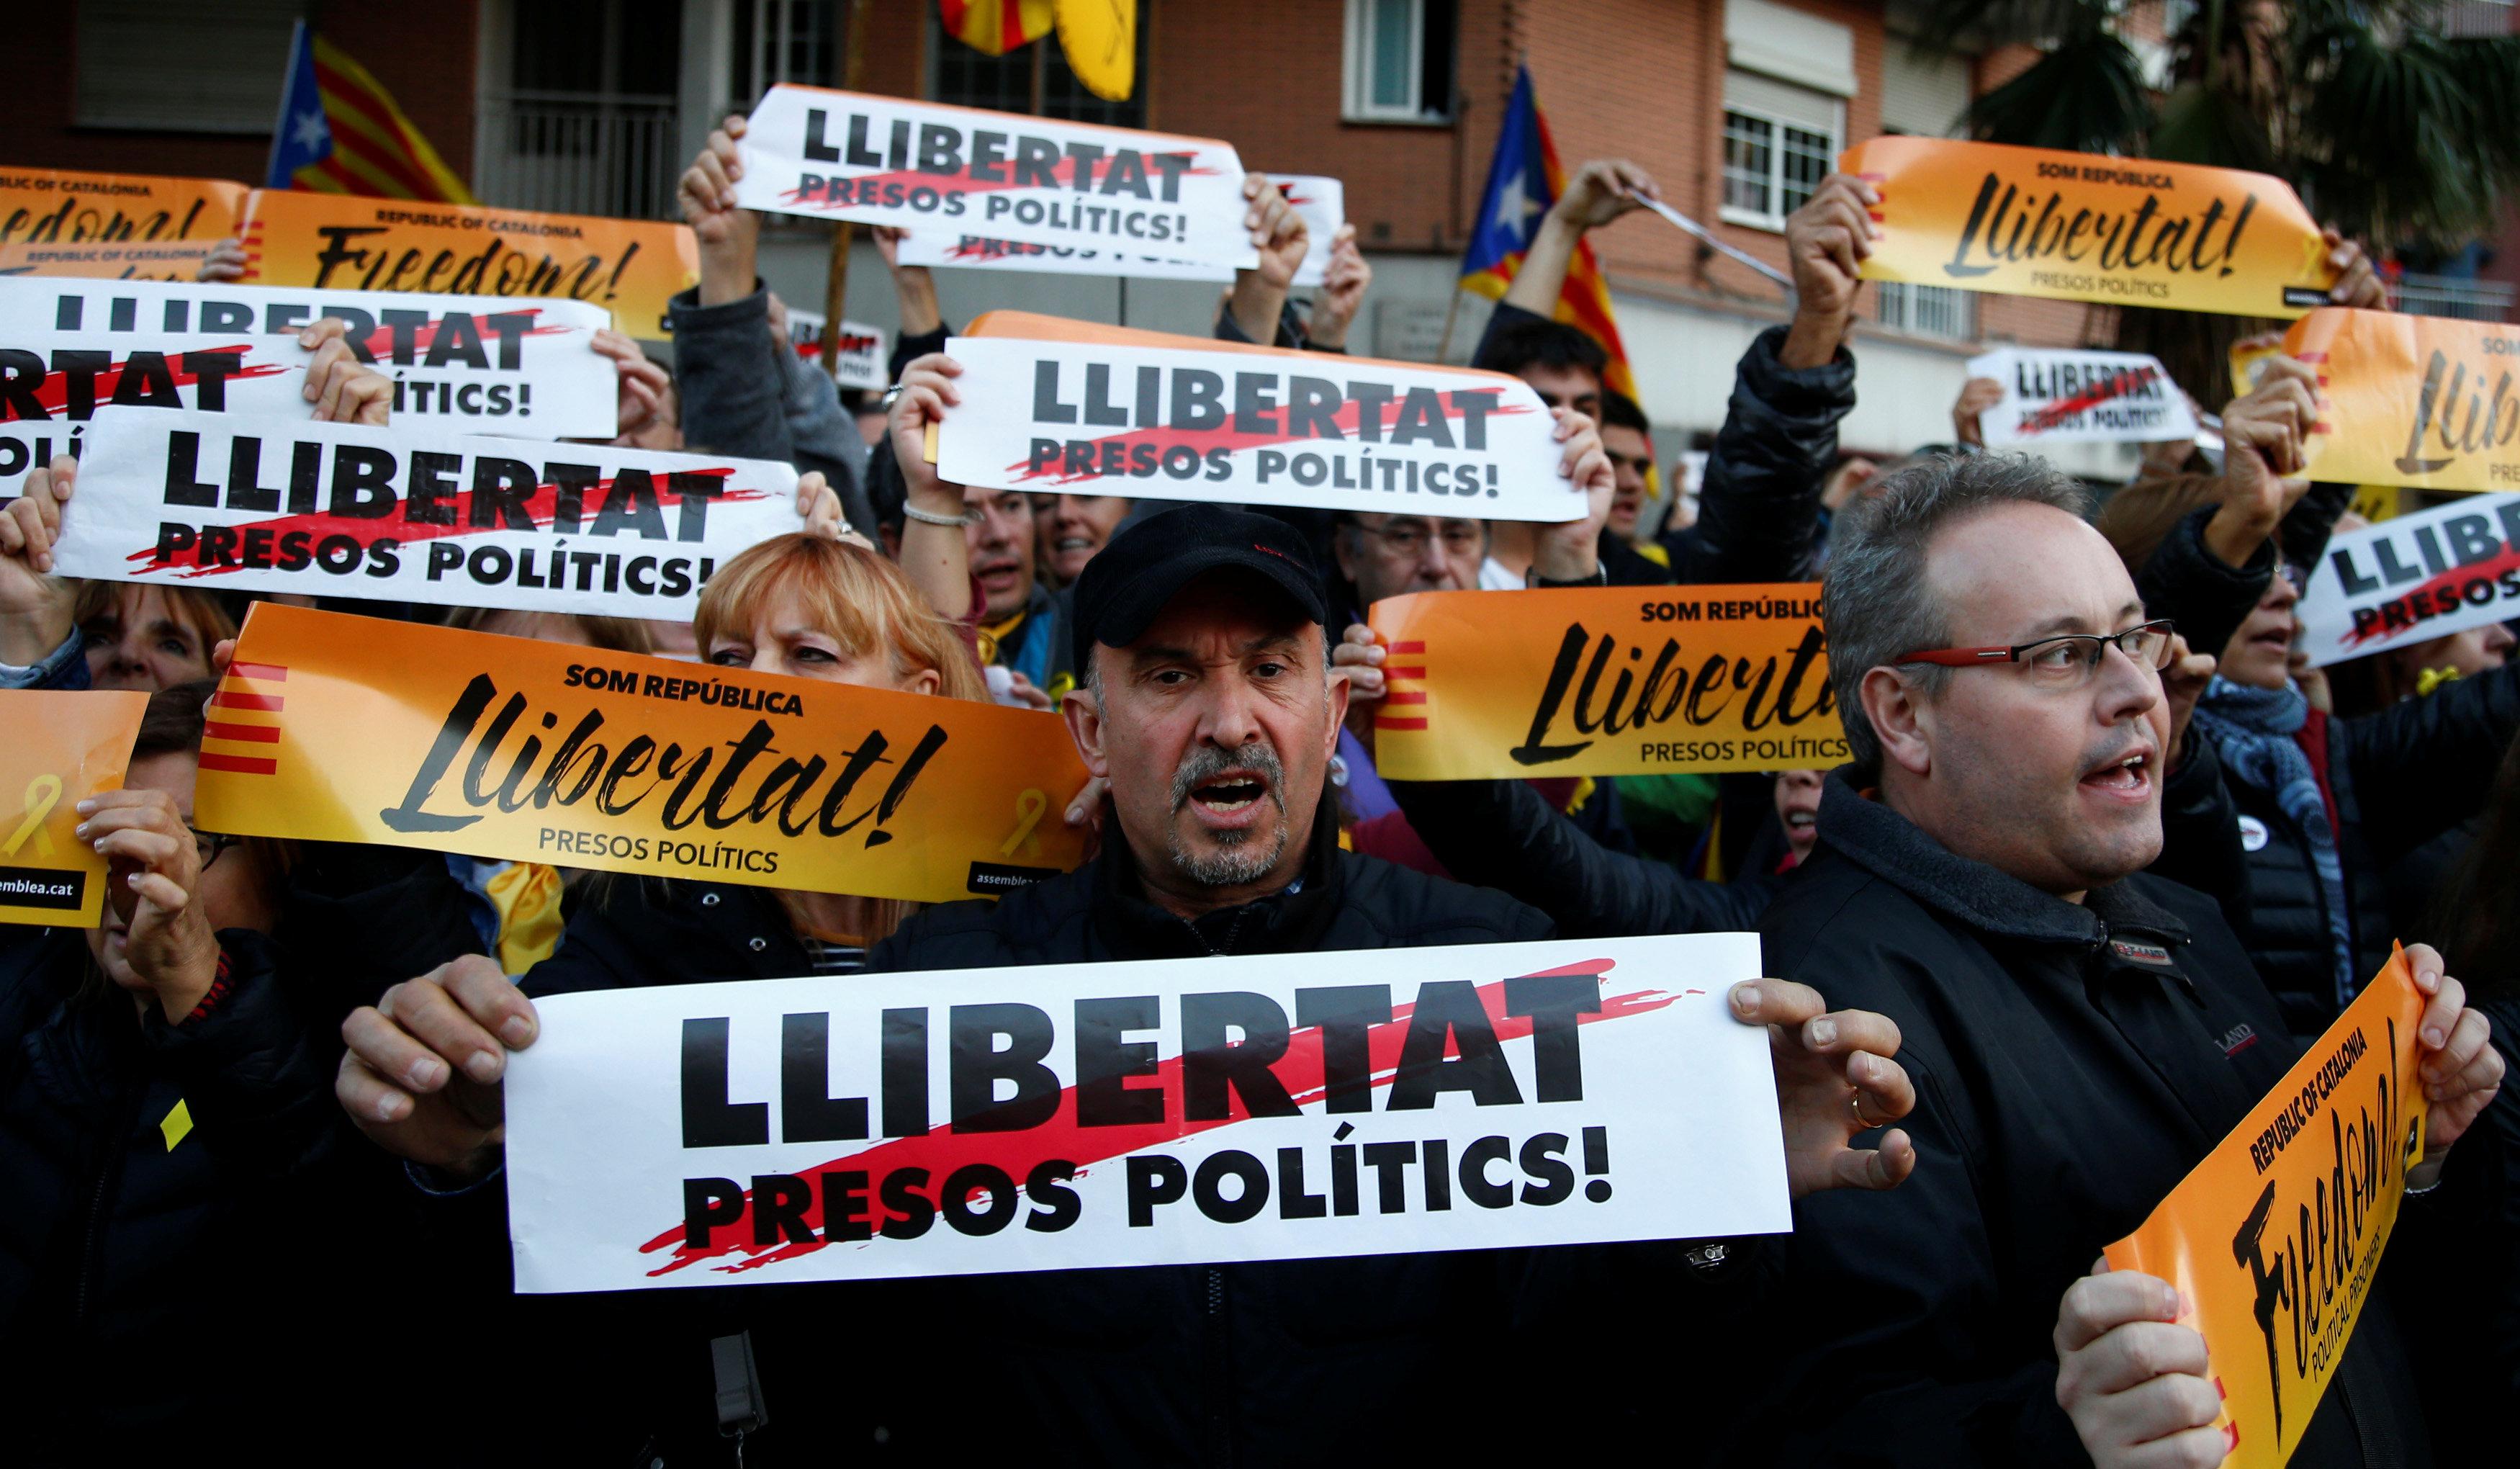 Catalan independence supporters rally in Barcelona demanding release of separatist leaders